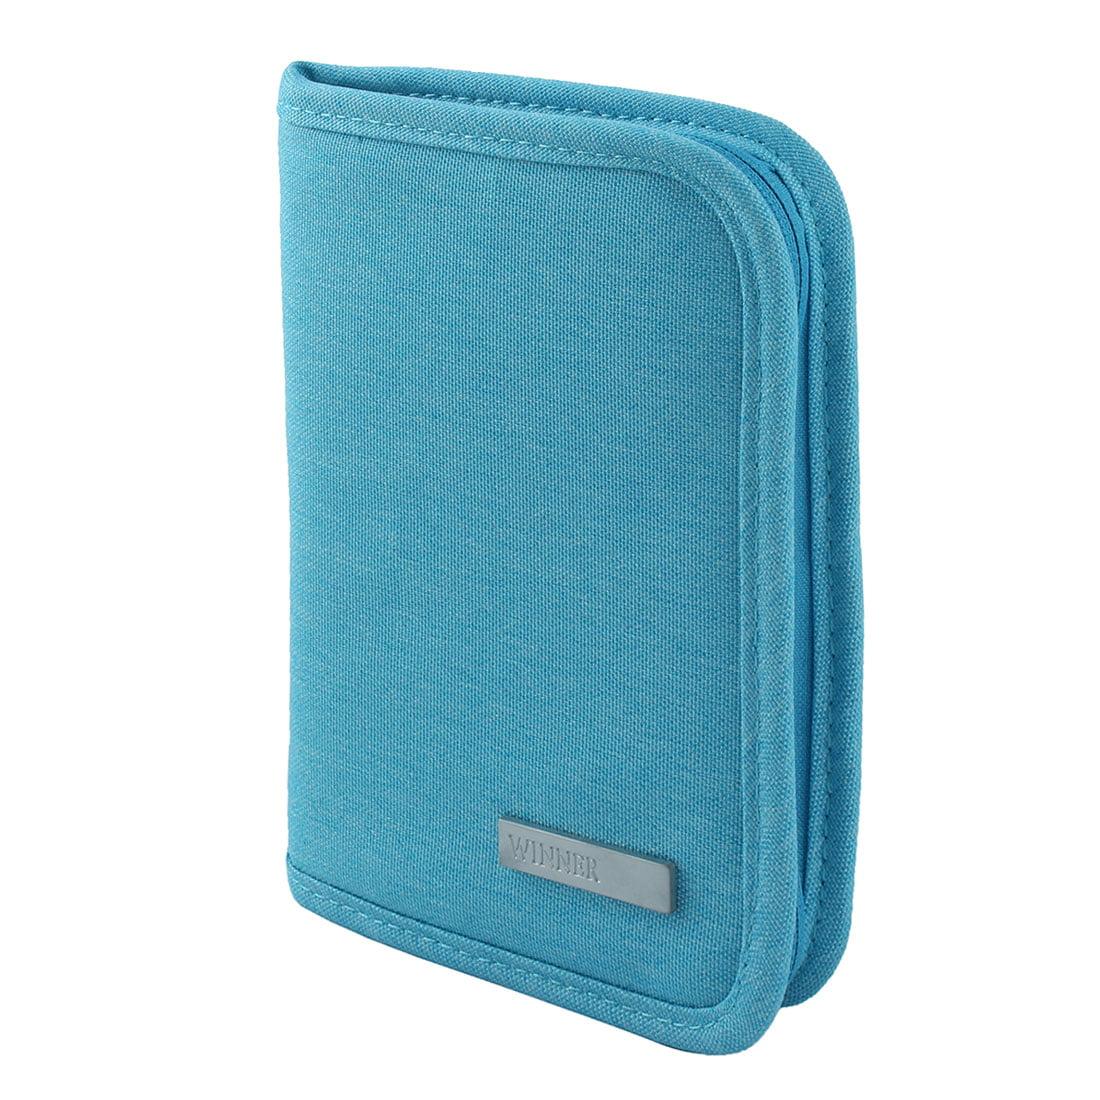 Business Travel Passport Holder Credit ID Card Cash Wallet Cover Document Bag Sky Blue